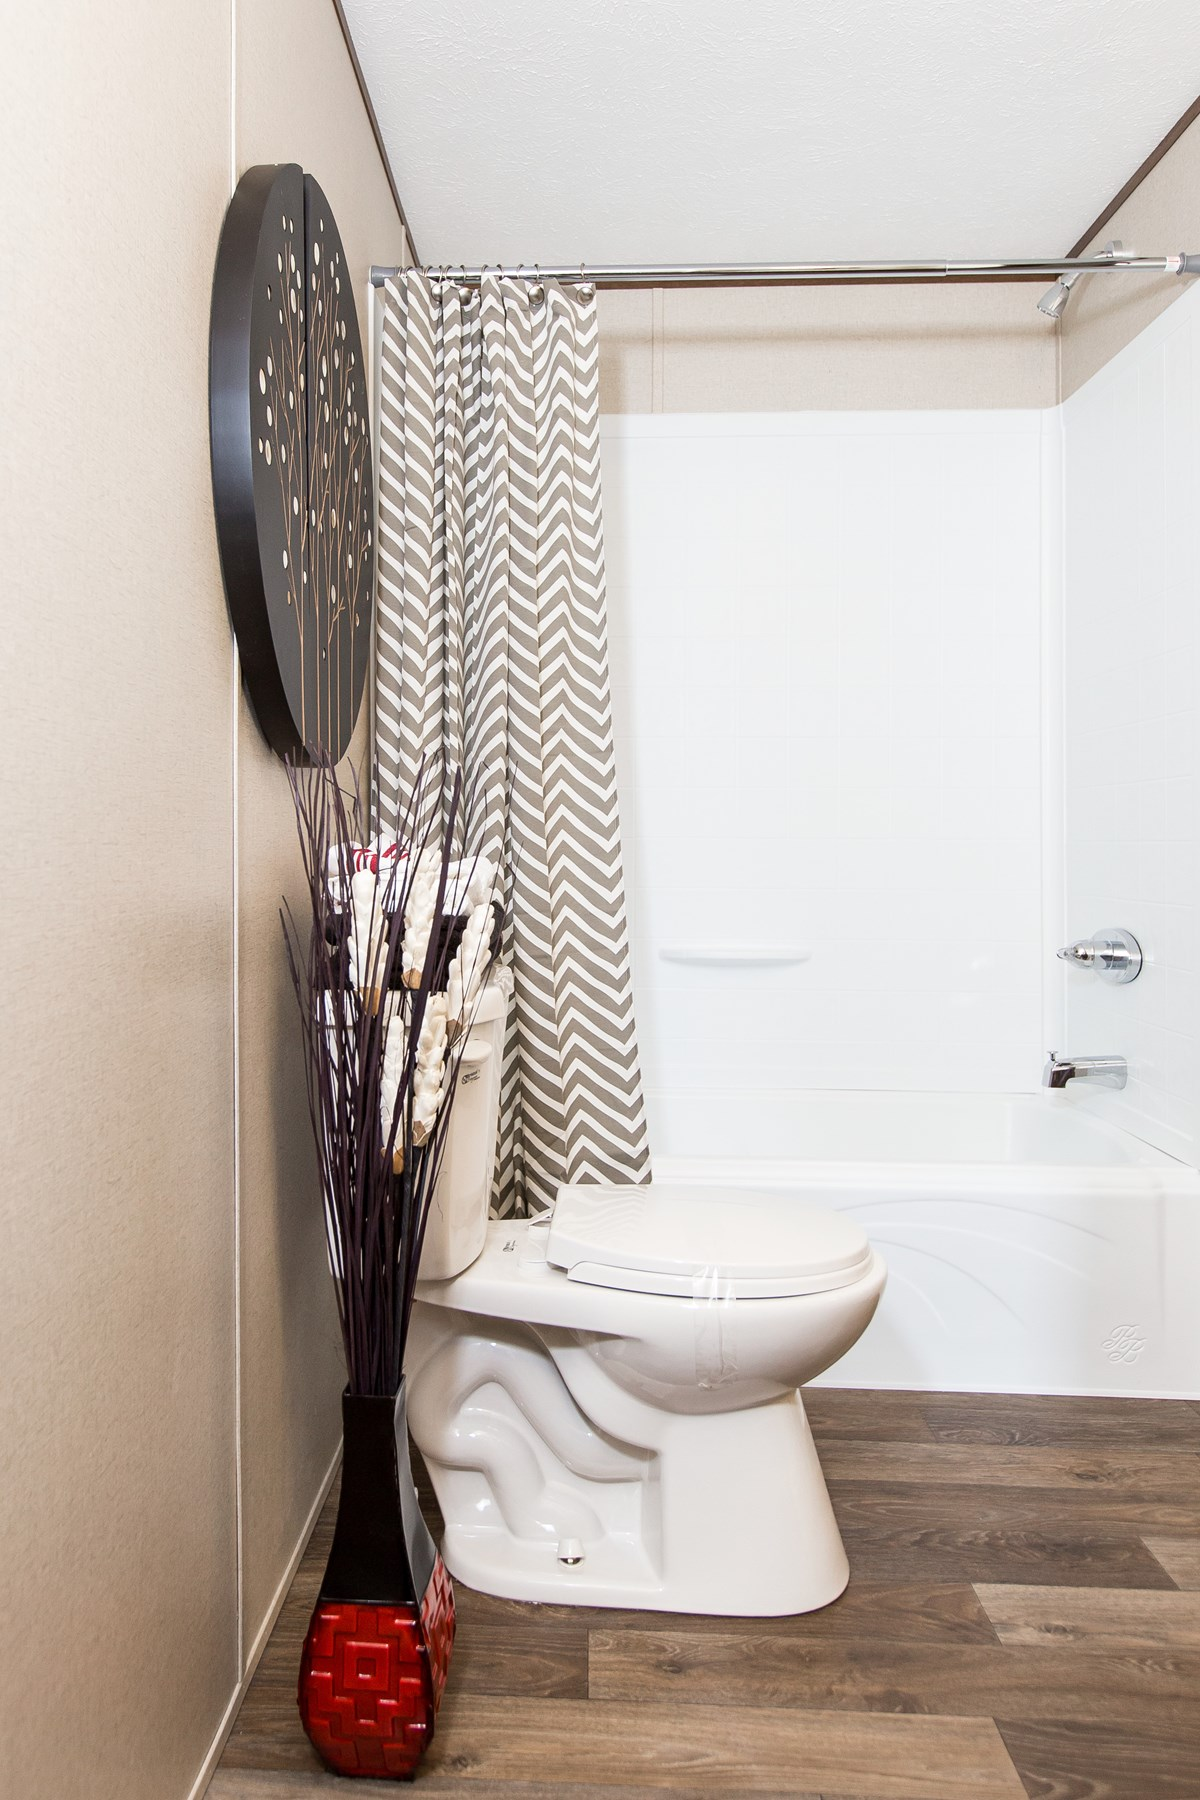 Manufactured-ELATION-36TRU14663AH-Master-Bathroom-20171214-1146271533254.jpg